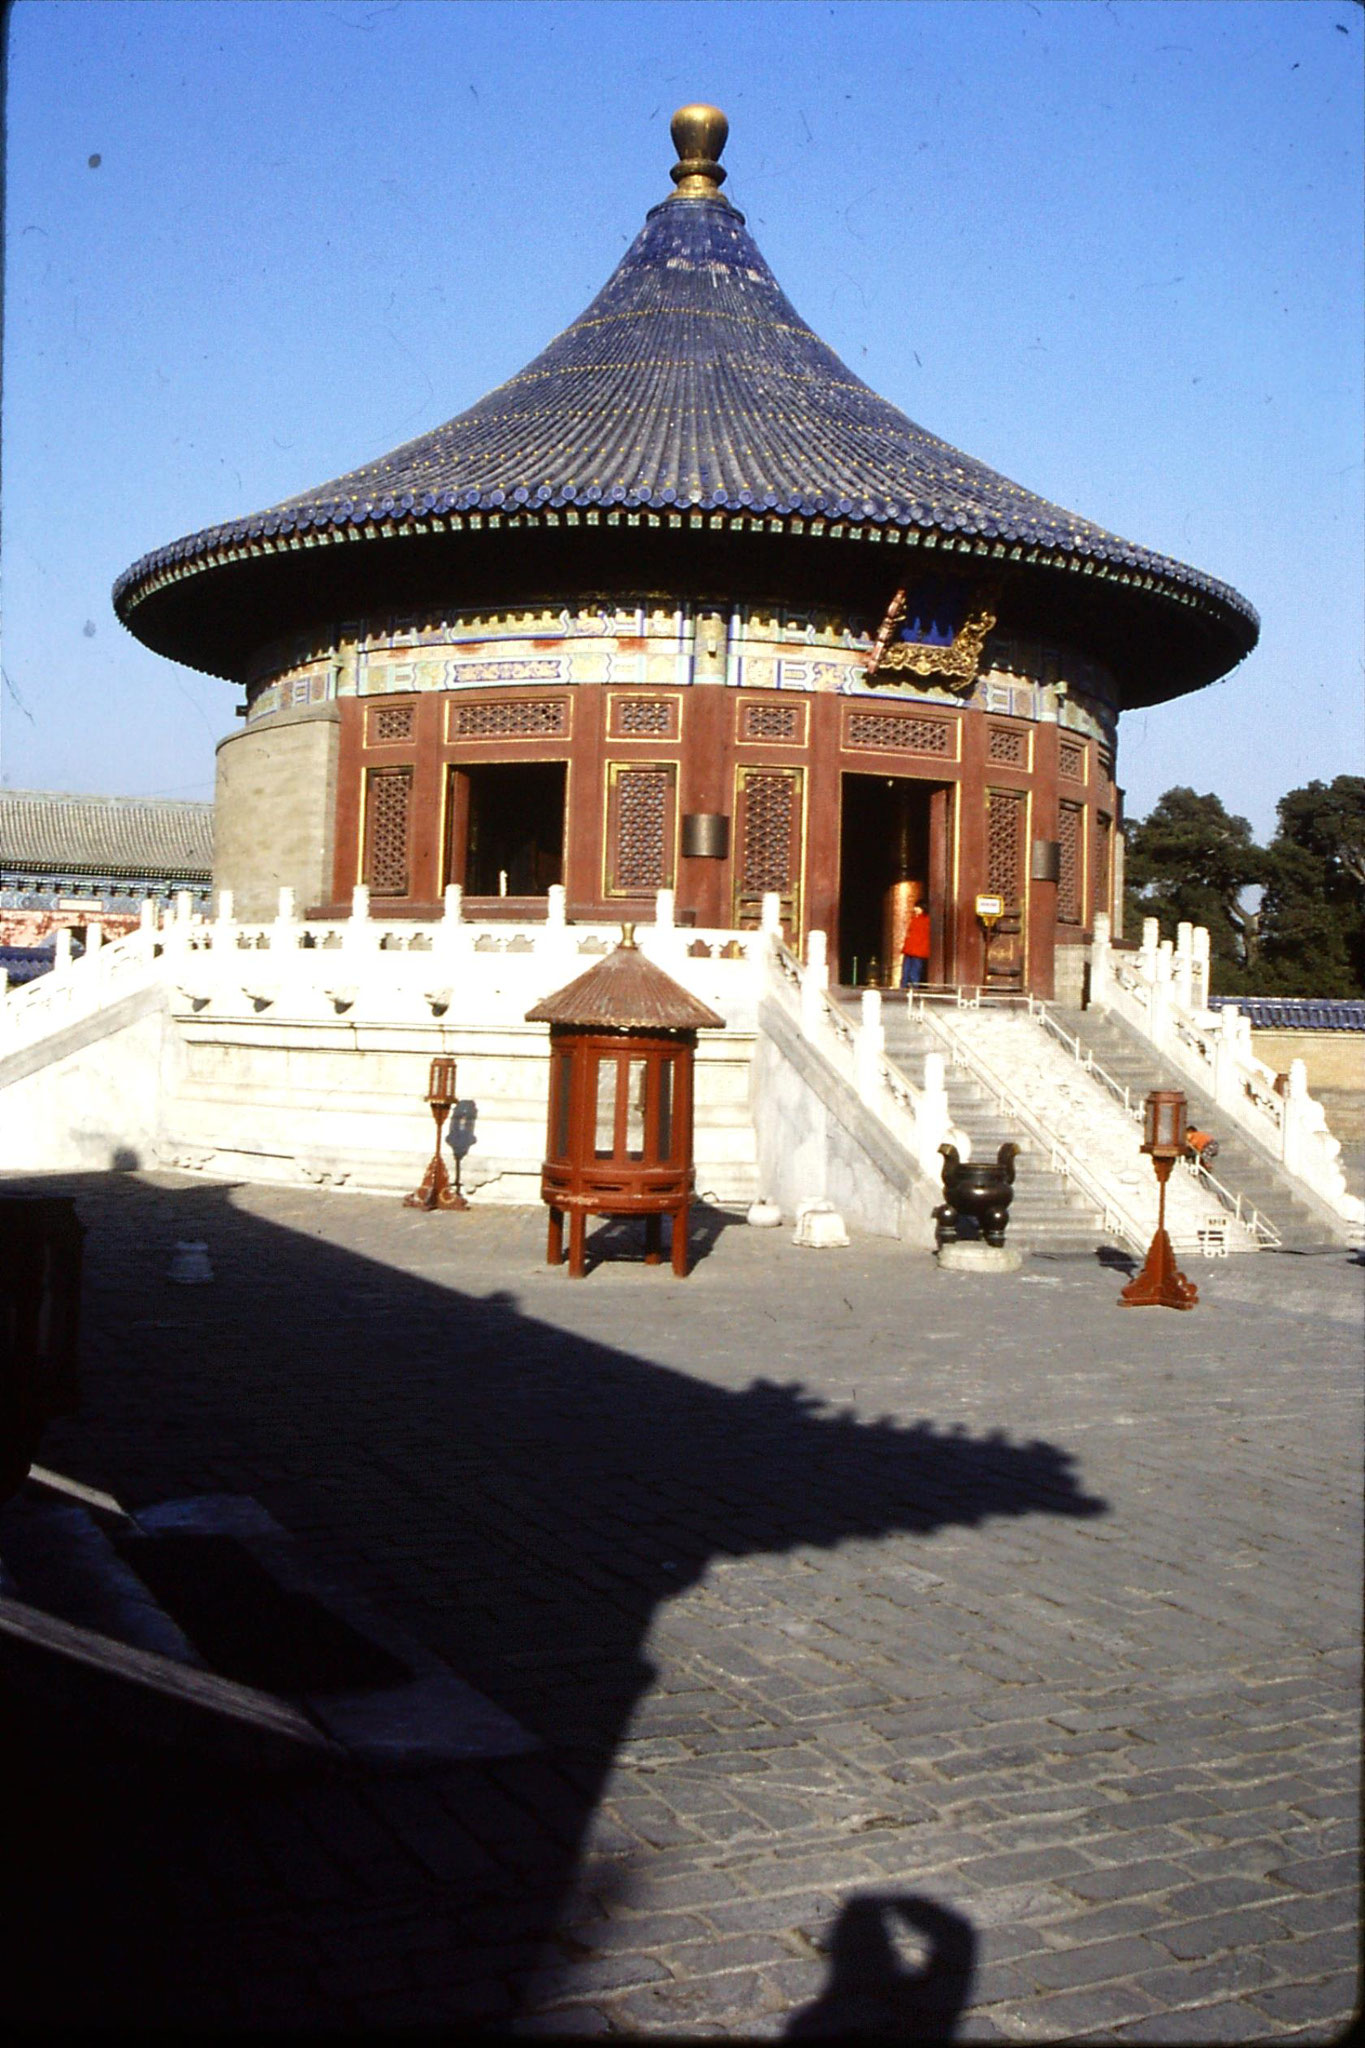 2/12/1988: 18: Tiantan Park